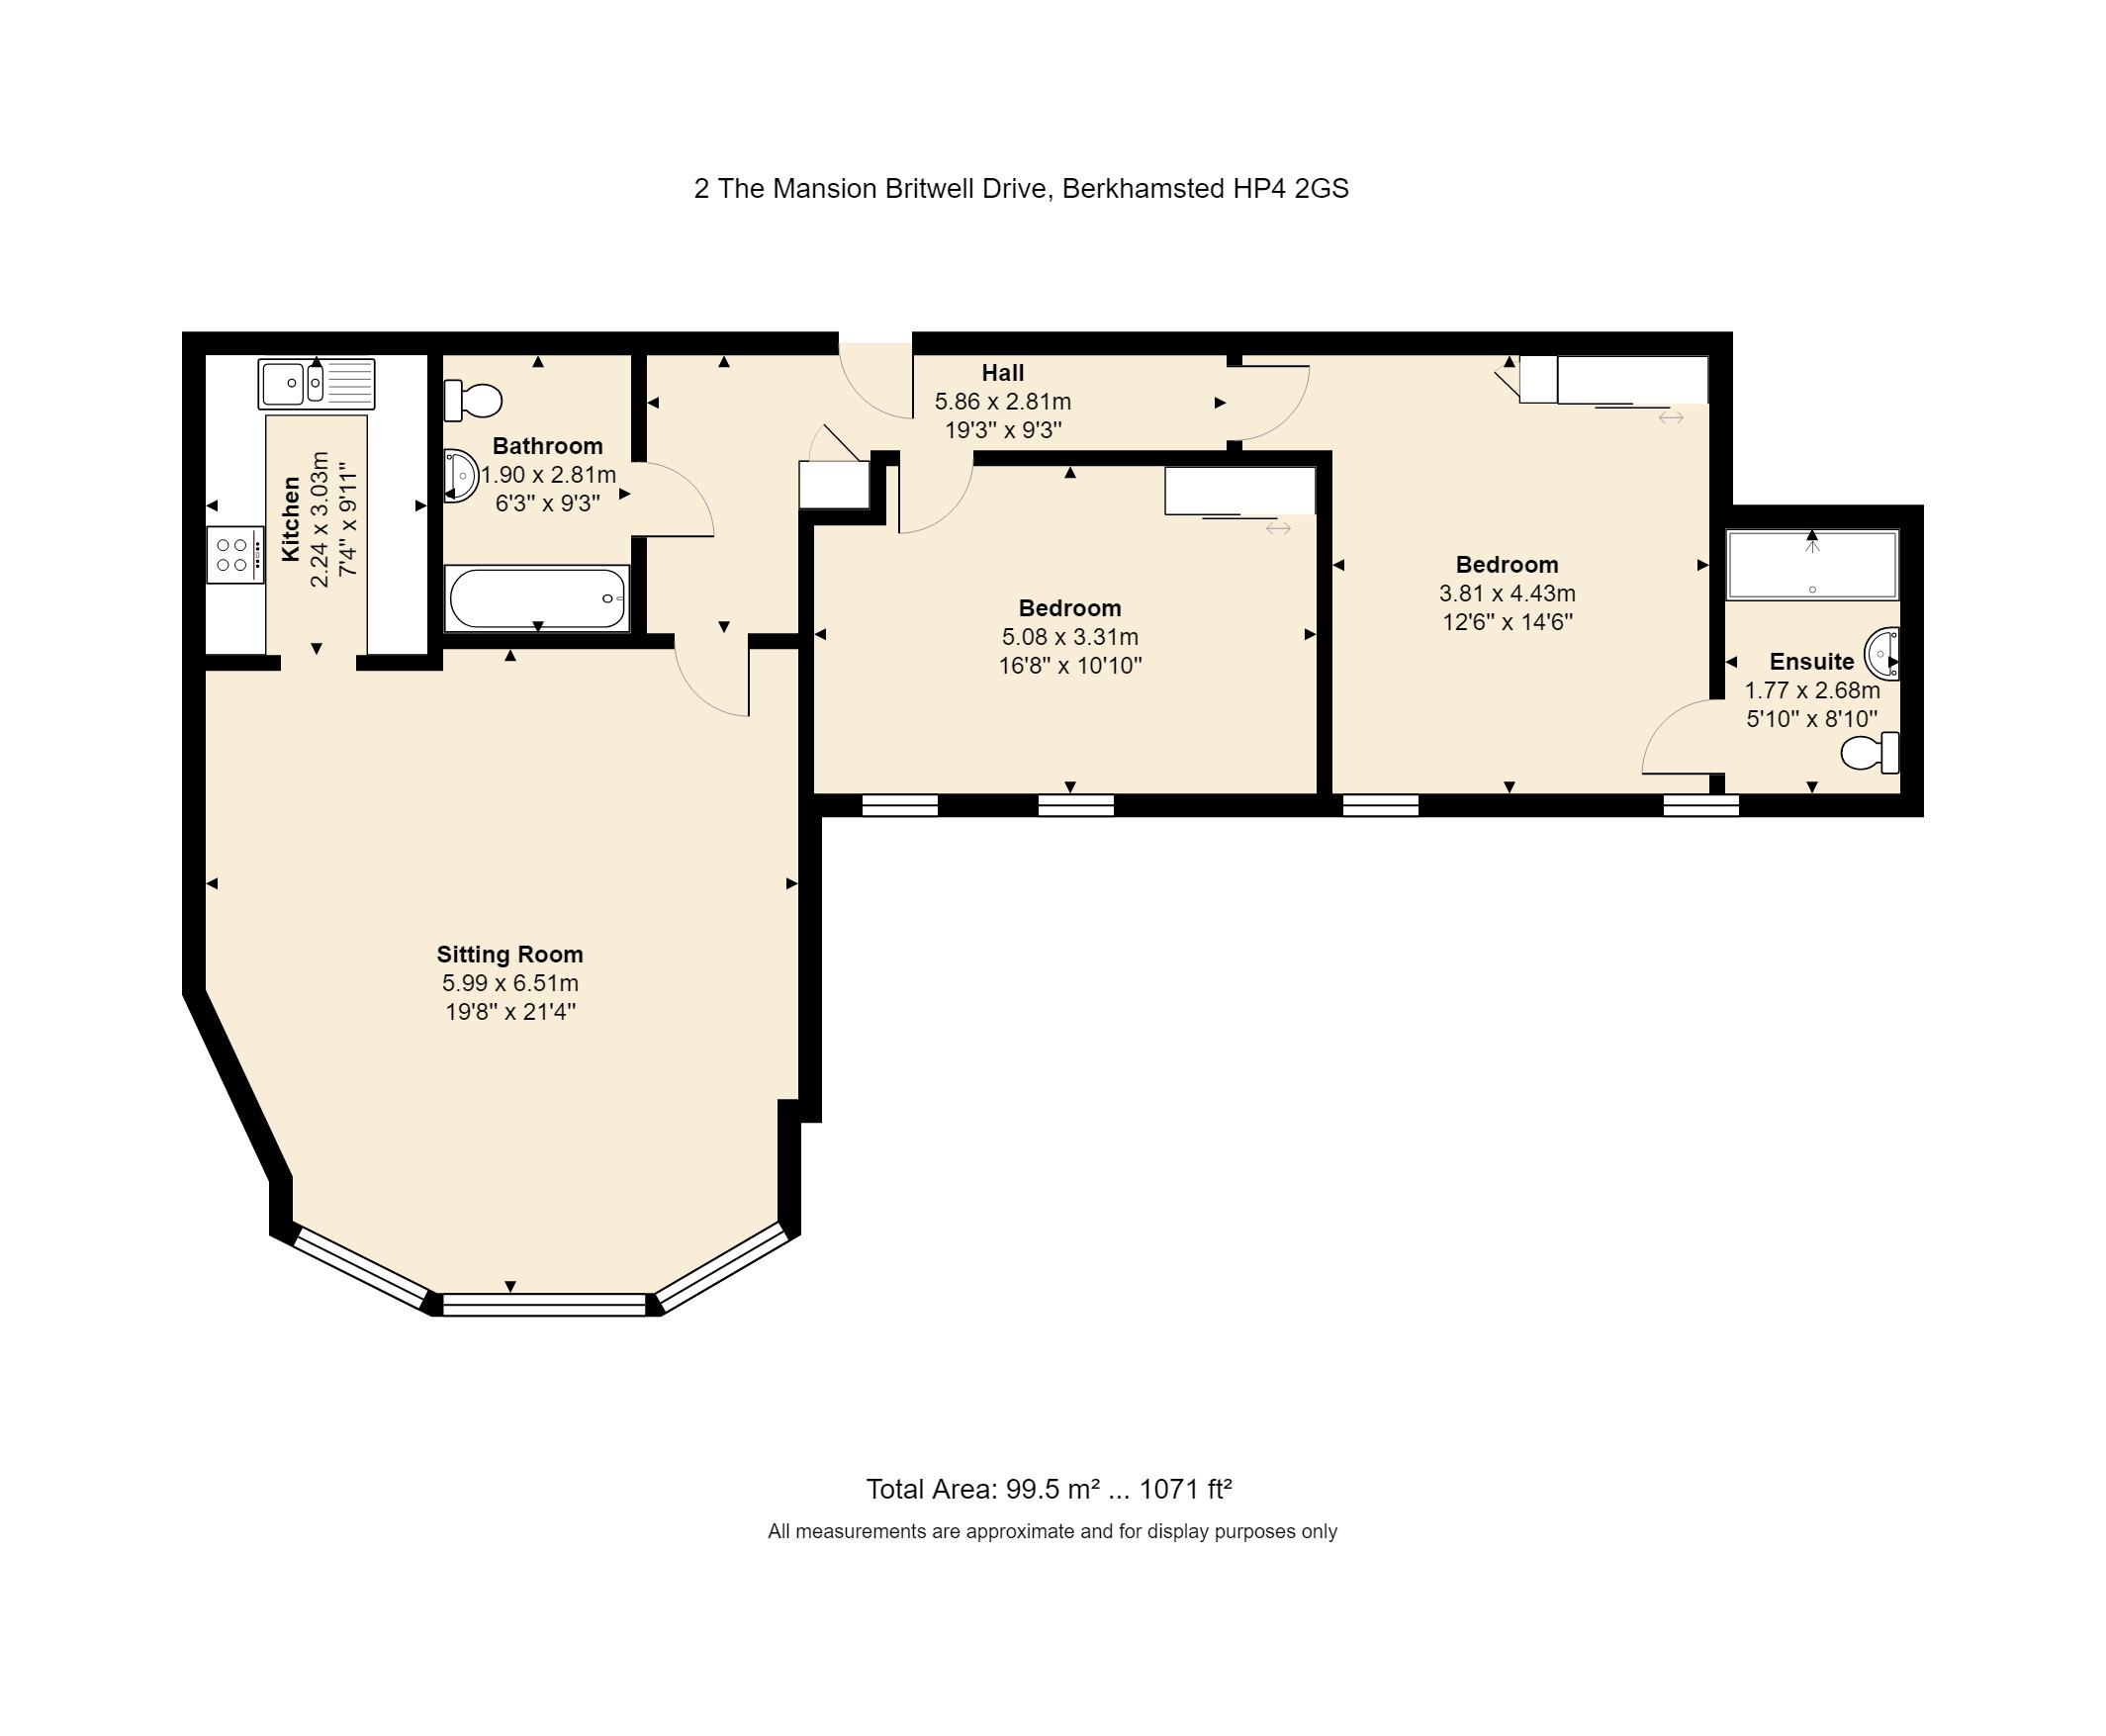 2 The Mansion Floorplan